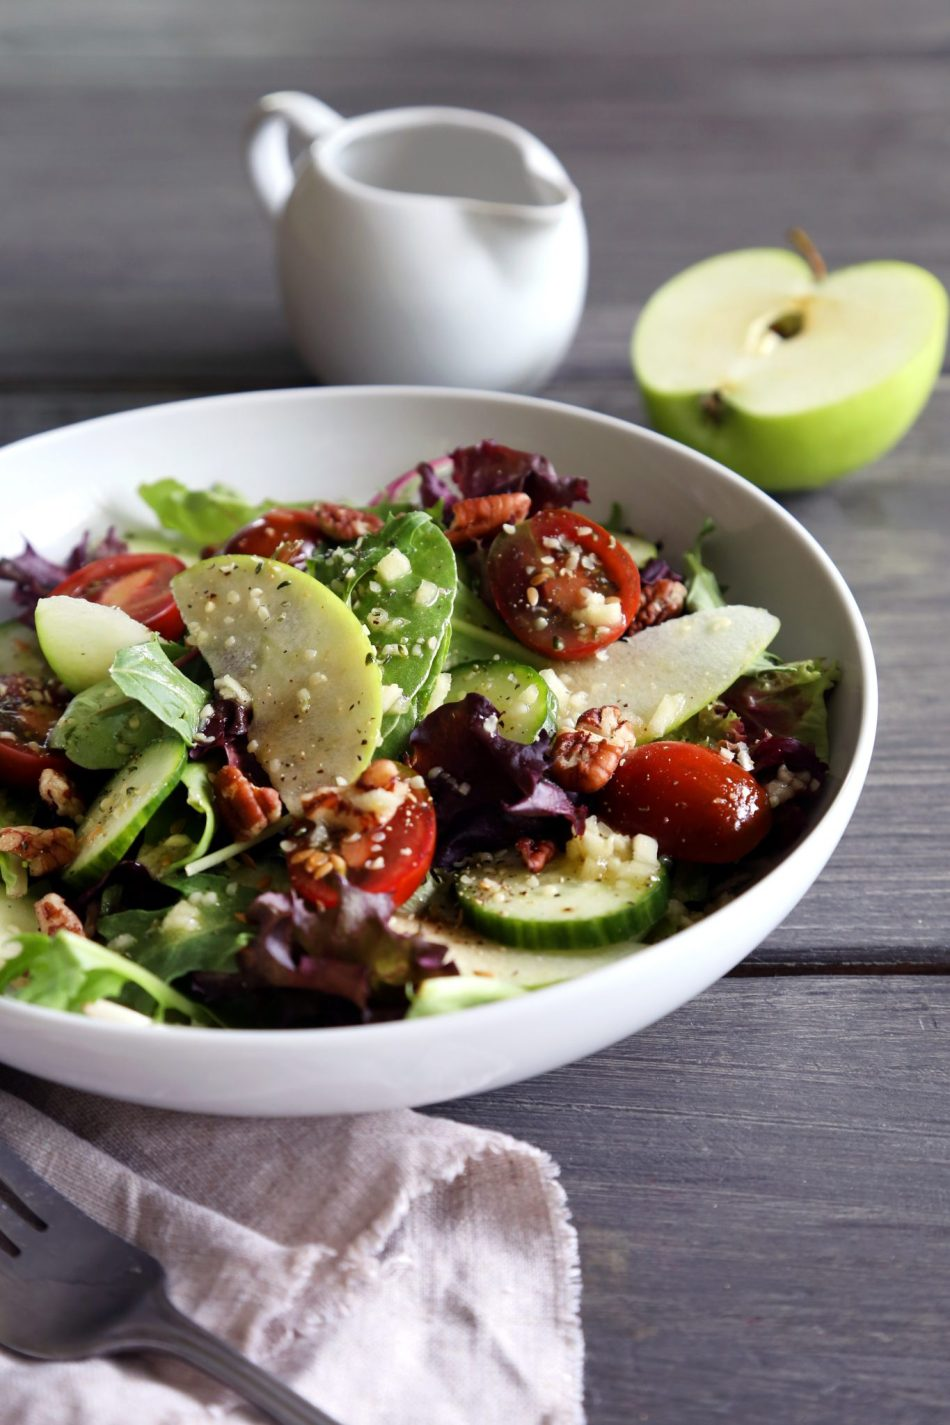 Mixed Greens with Veggies, Apples & an Apple Cider Vinaigrette